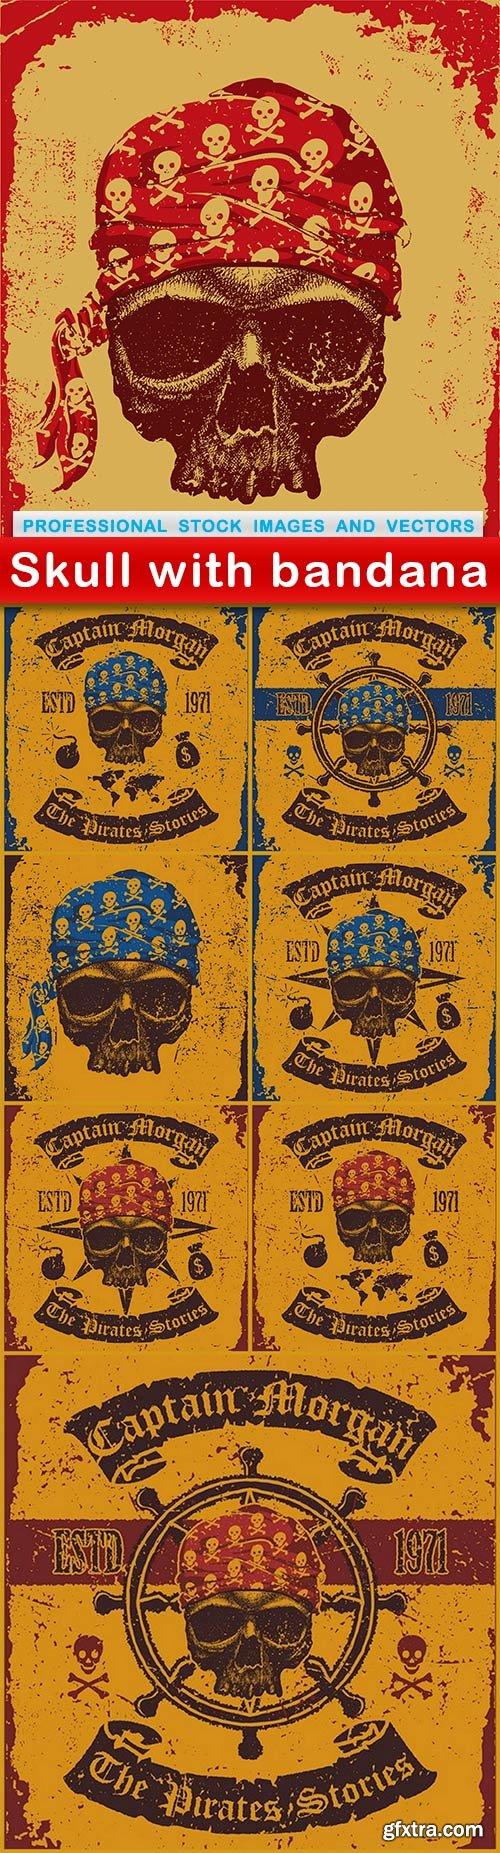 Skull with bandana - 8 EPS